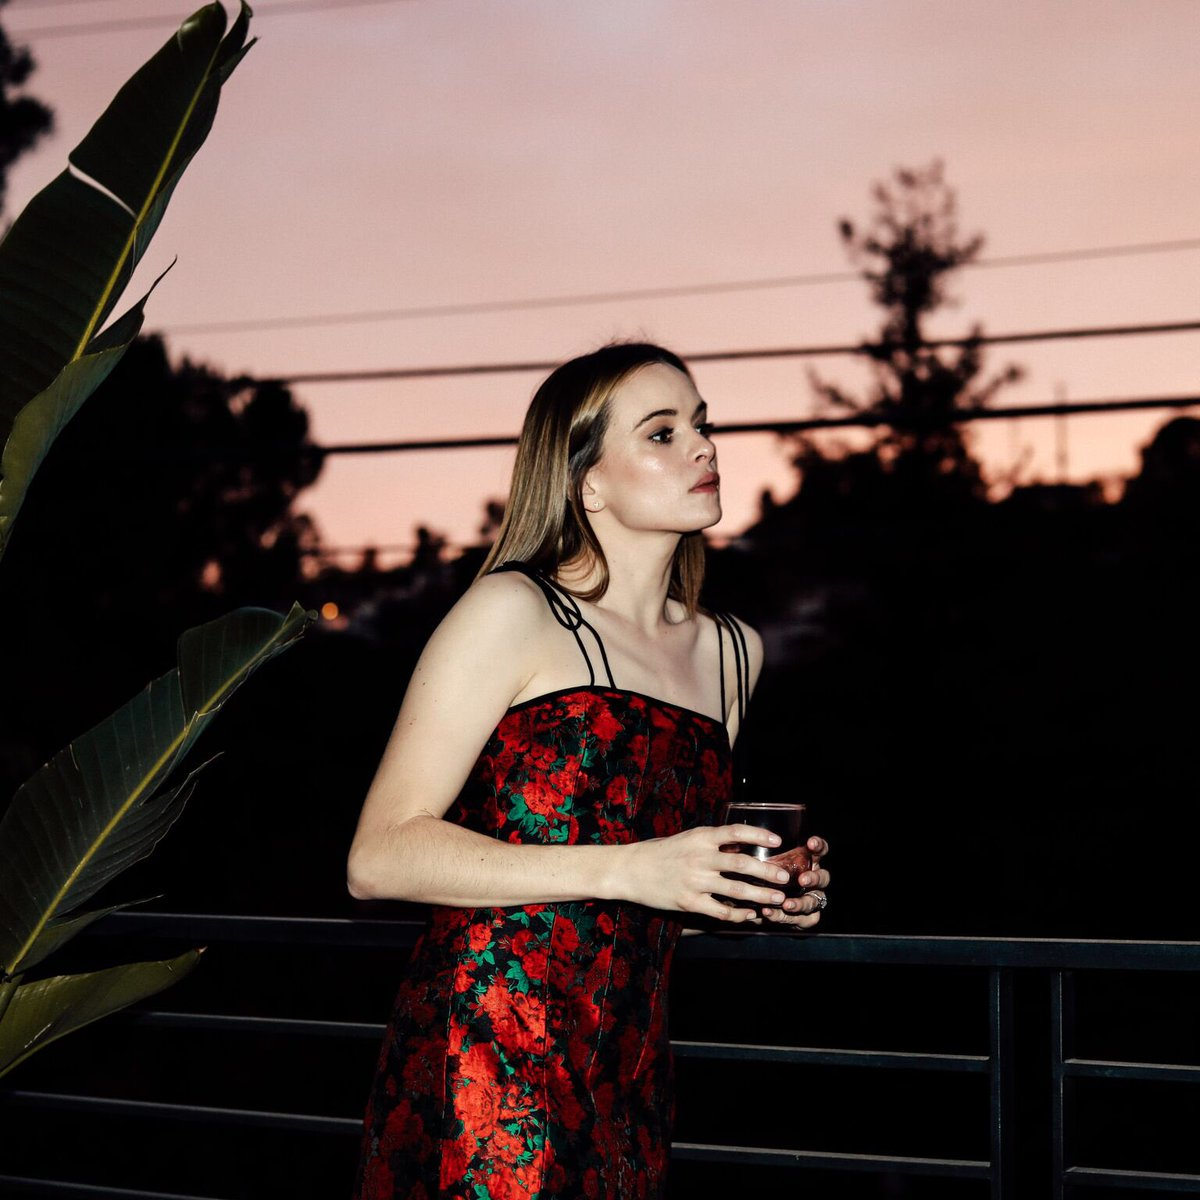 Pictures Viviana Figueredo nude photos 2019